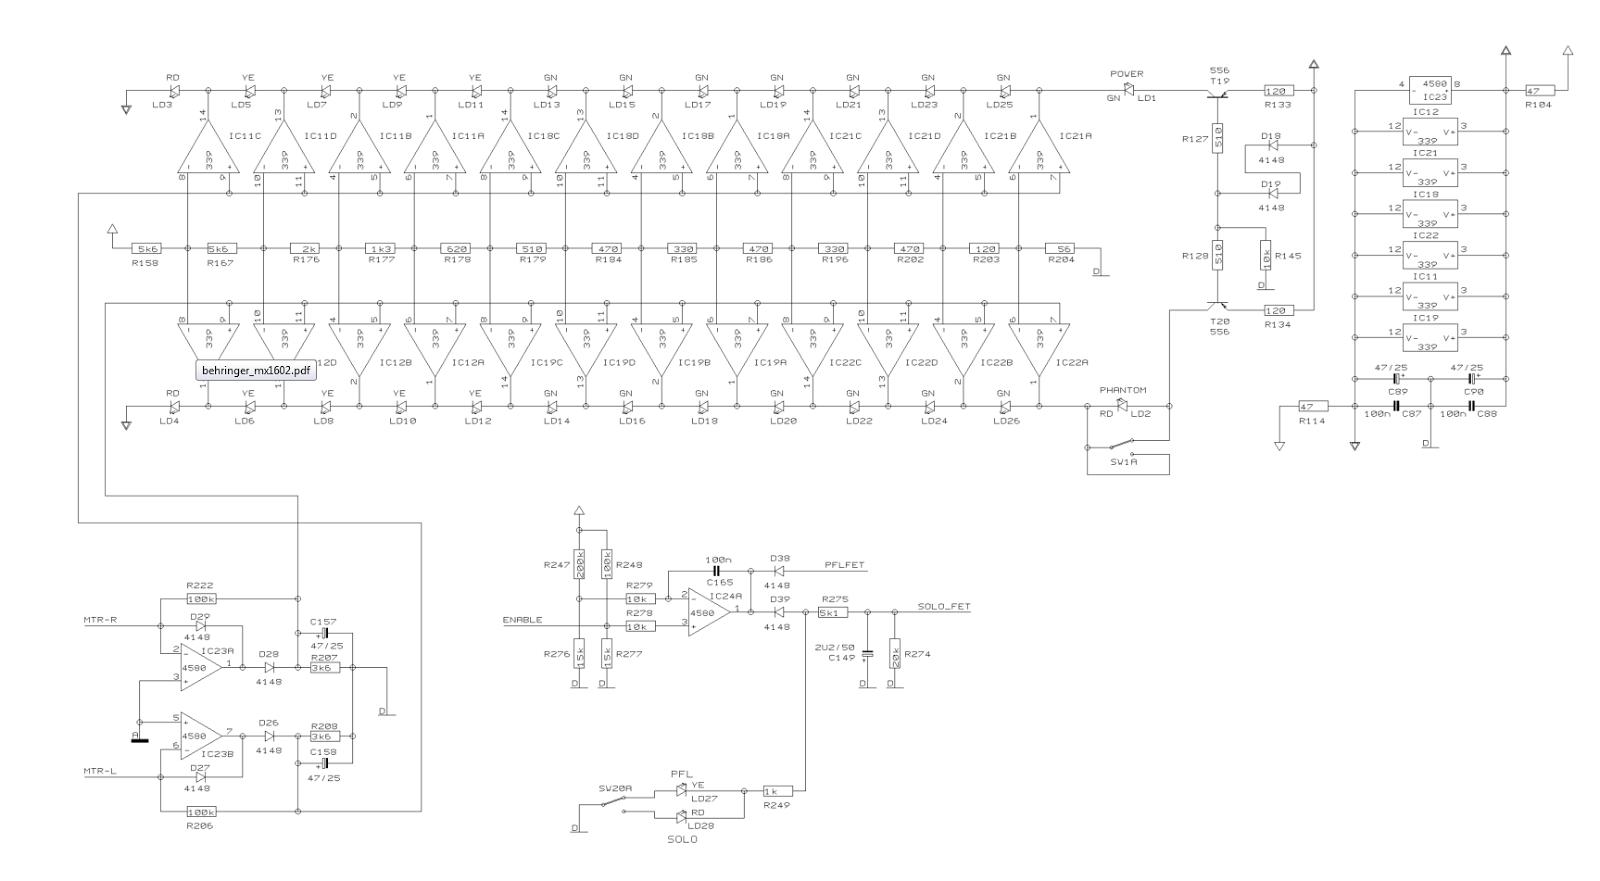 Behringer MX-1602A vu-meters schematic